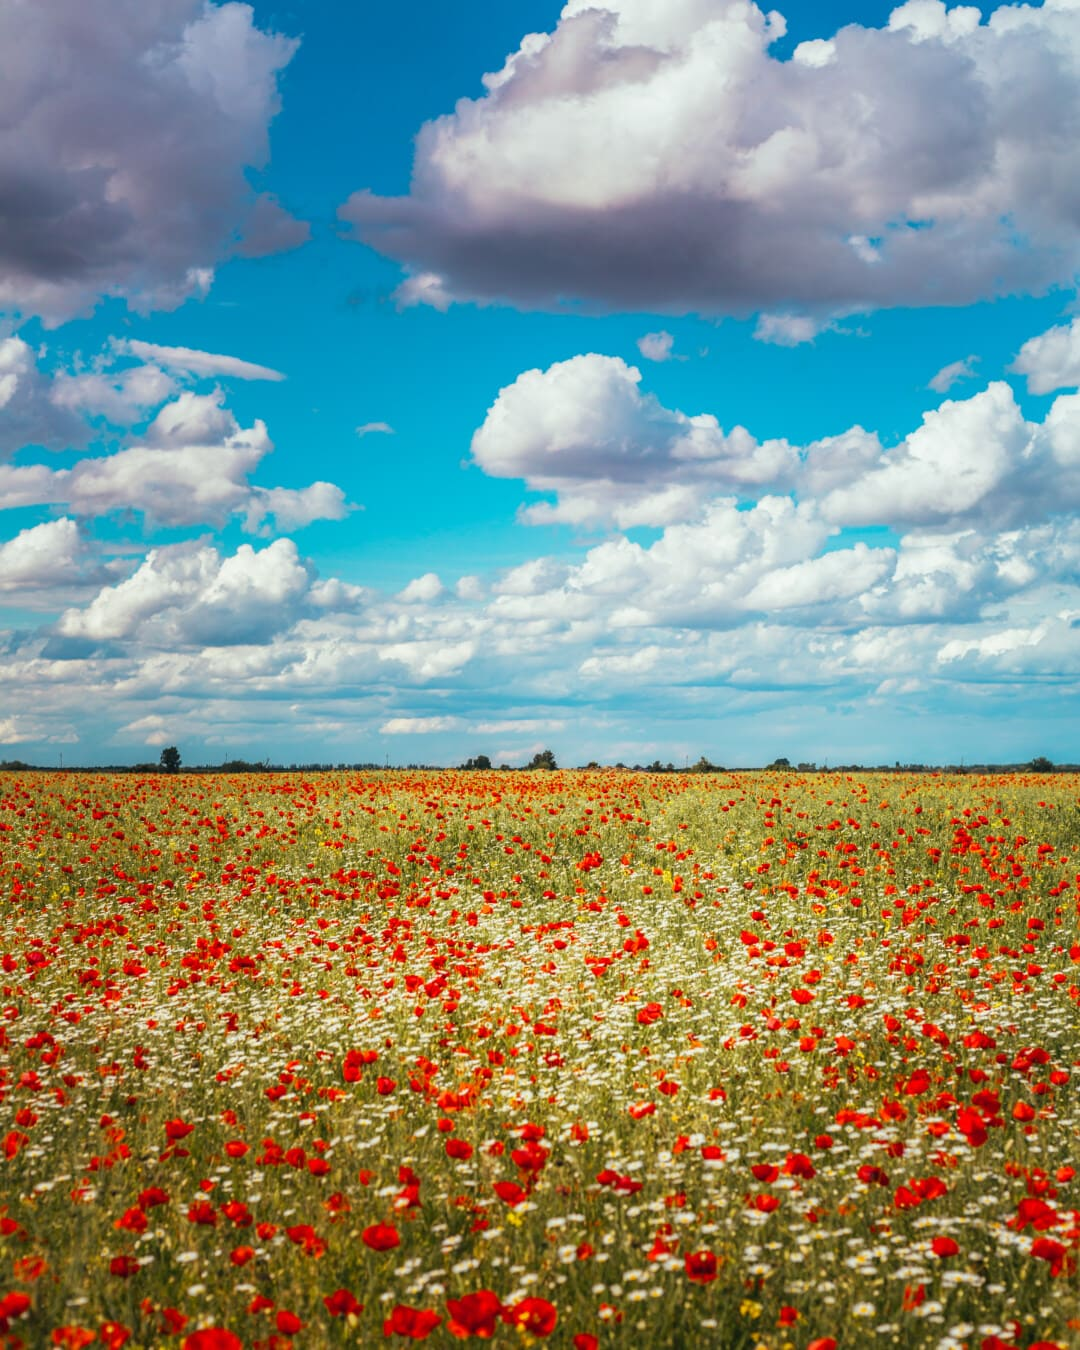 summer season, idyllic, wildflower, poppy, opium poppy, chamomile, flower, field, landscape, rural